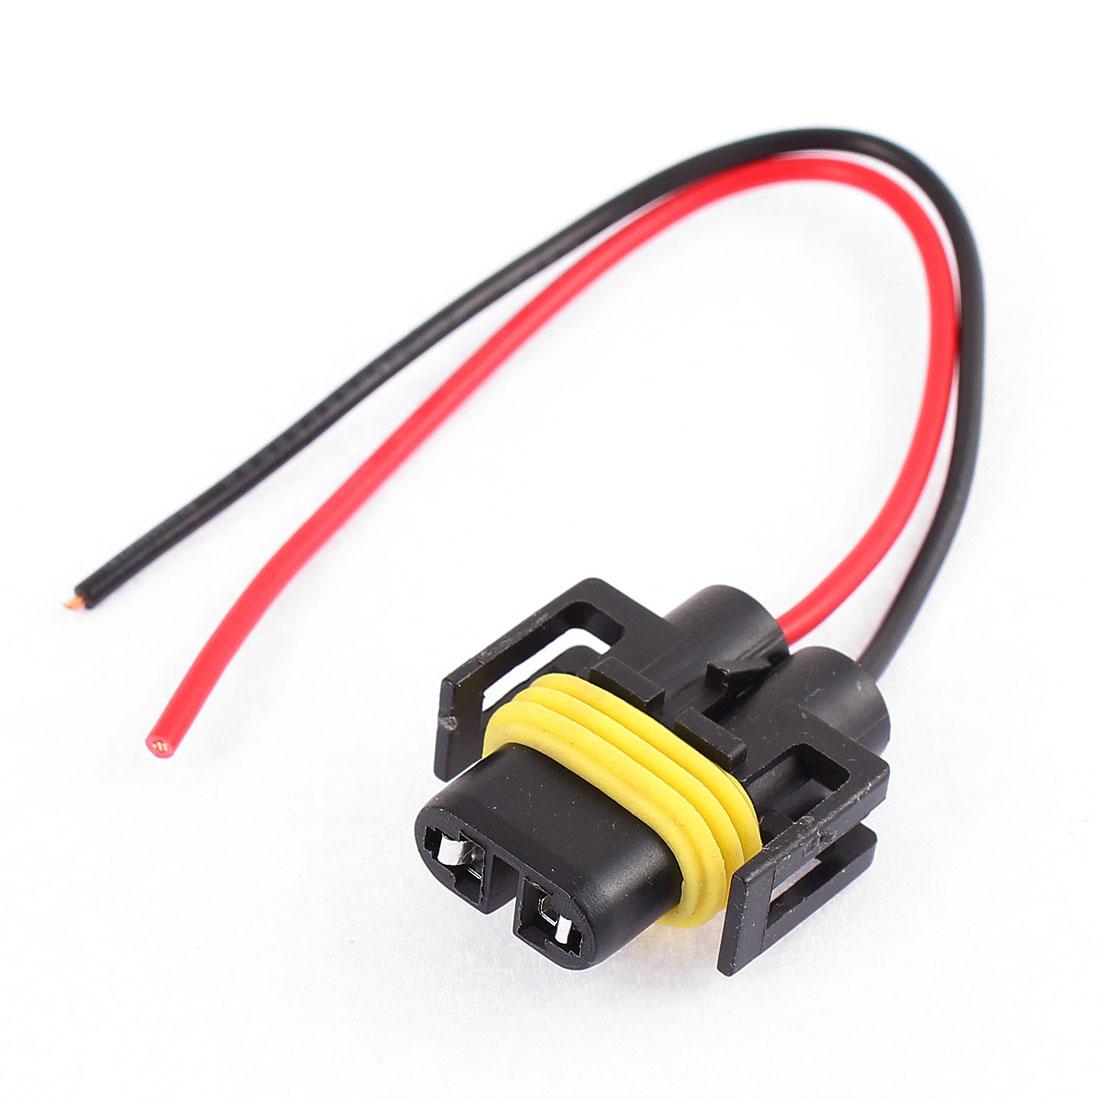 H11 Headlight Fog Light Connector Socket for Automobile